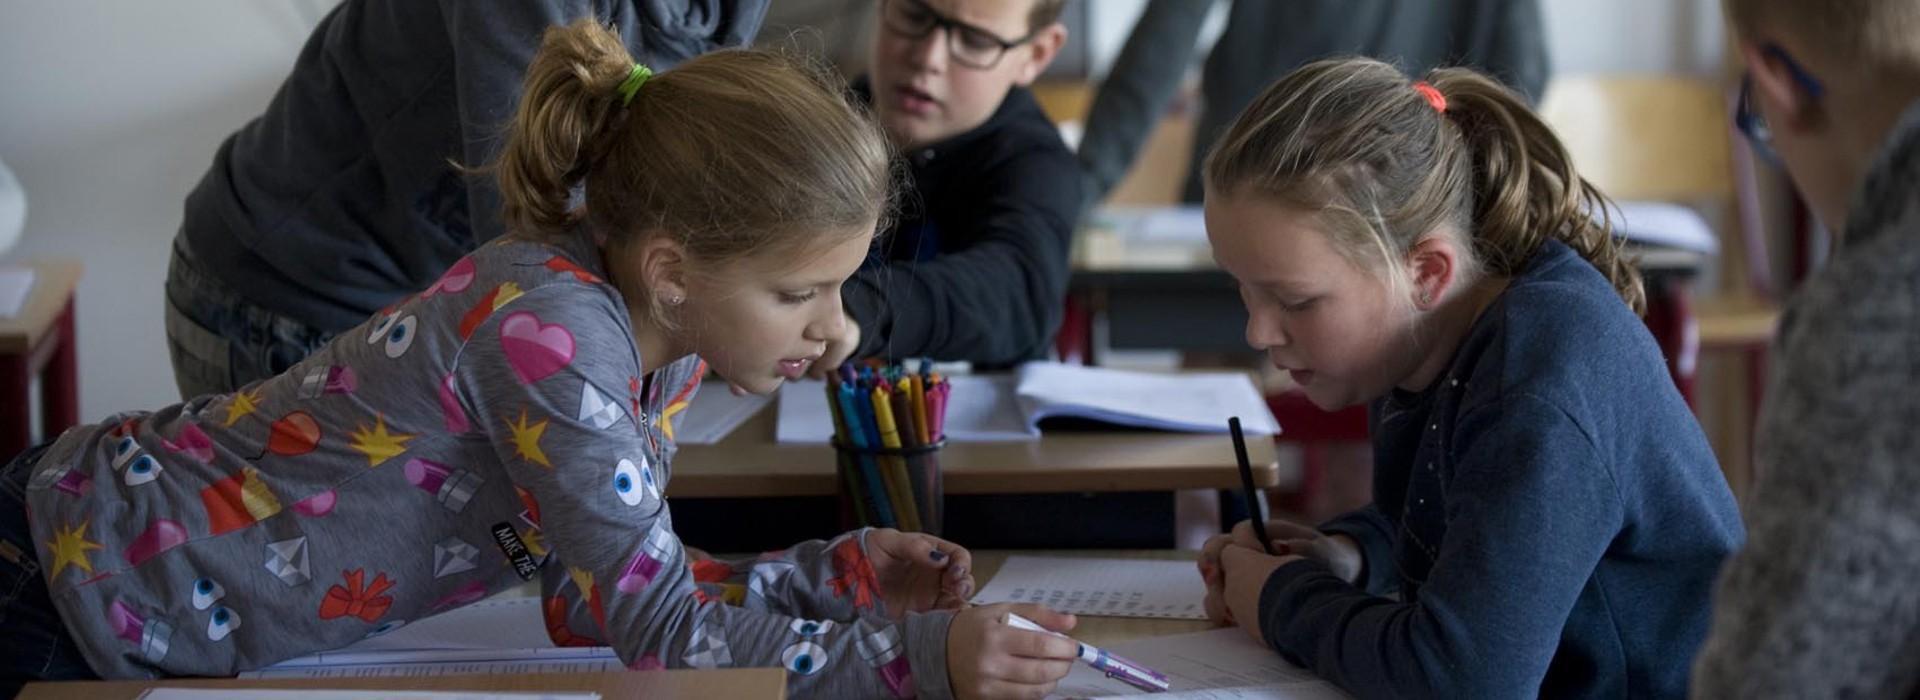 SWS De Diamant - basisschool in Oudega (Smallingerland)